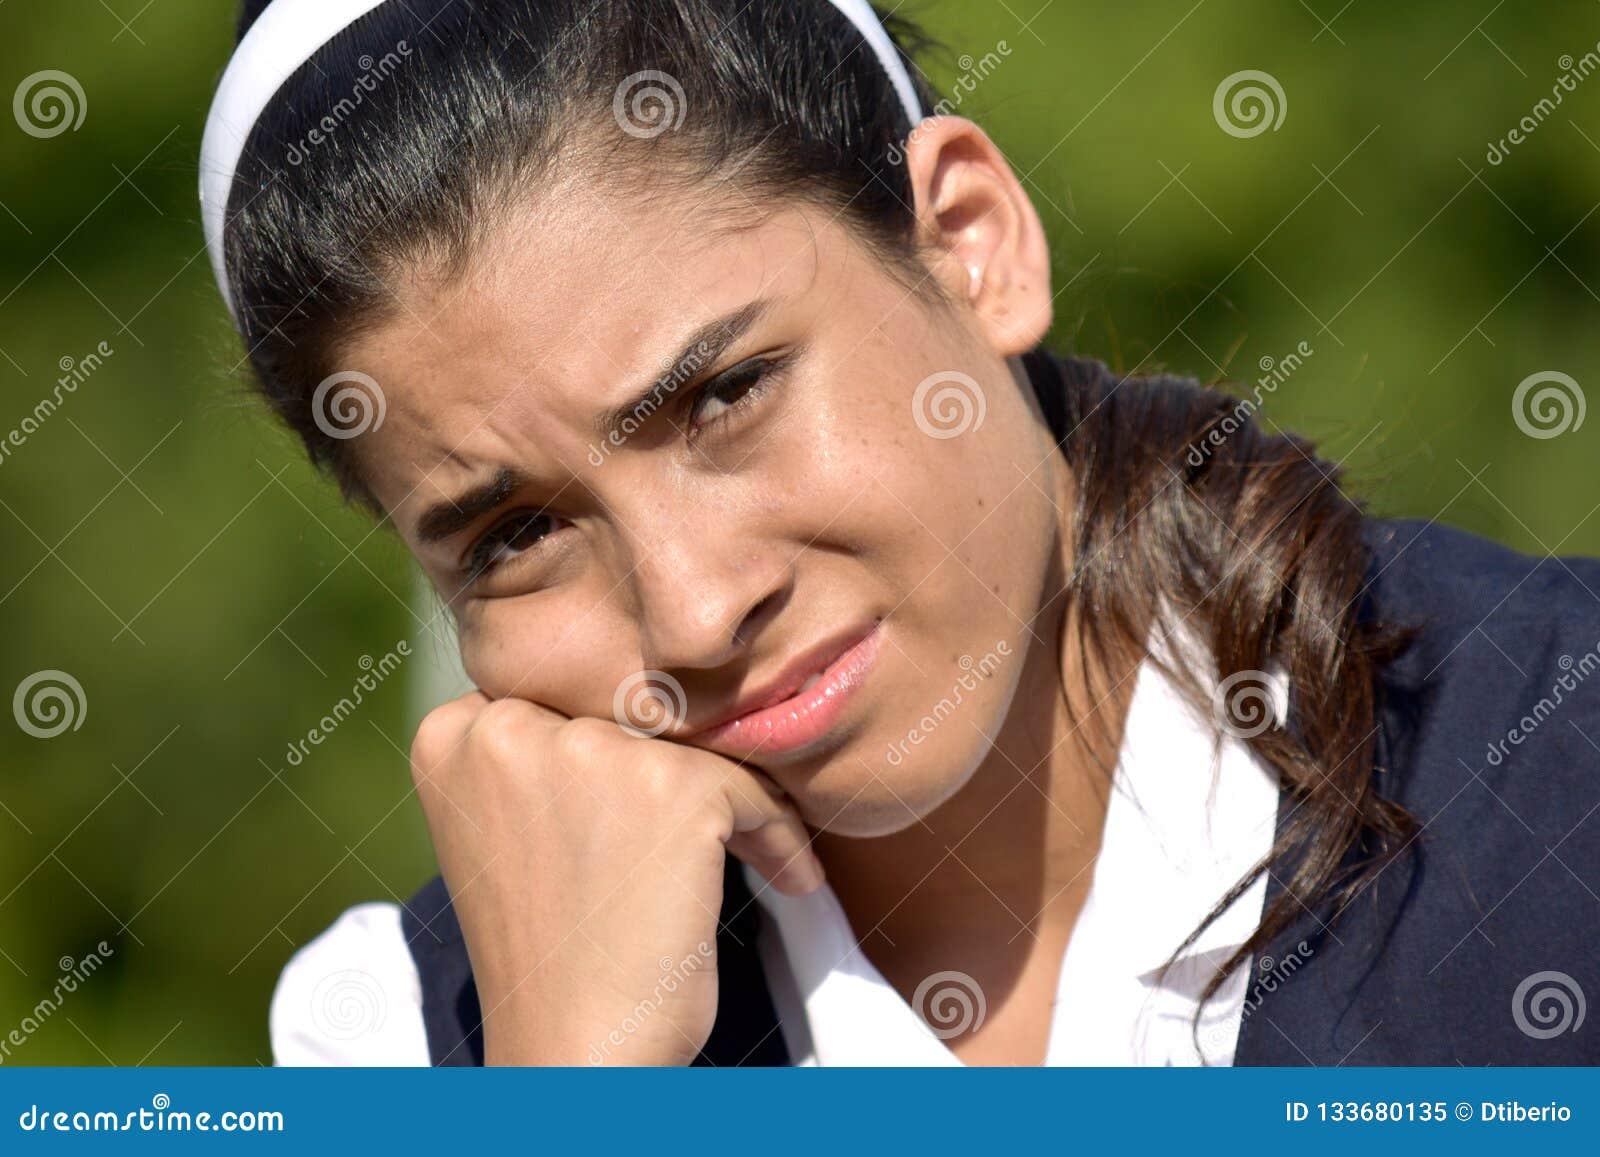 Columbian teen age girls sorry